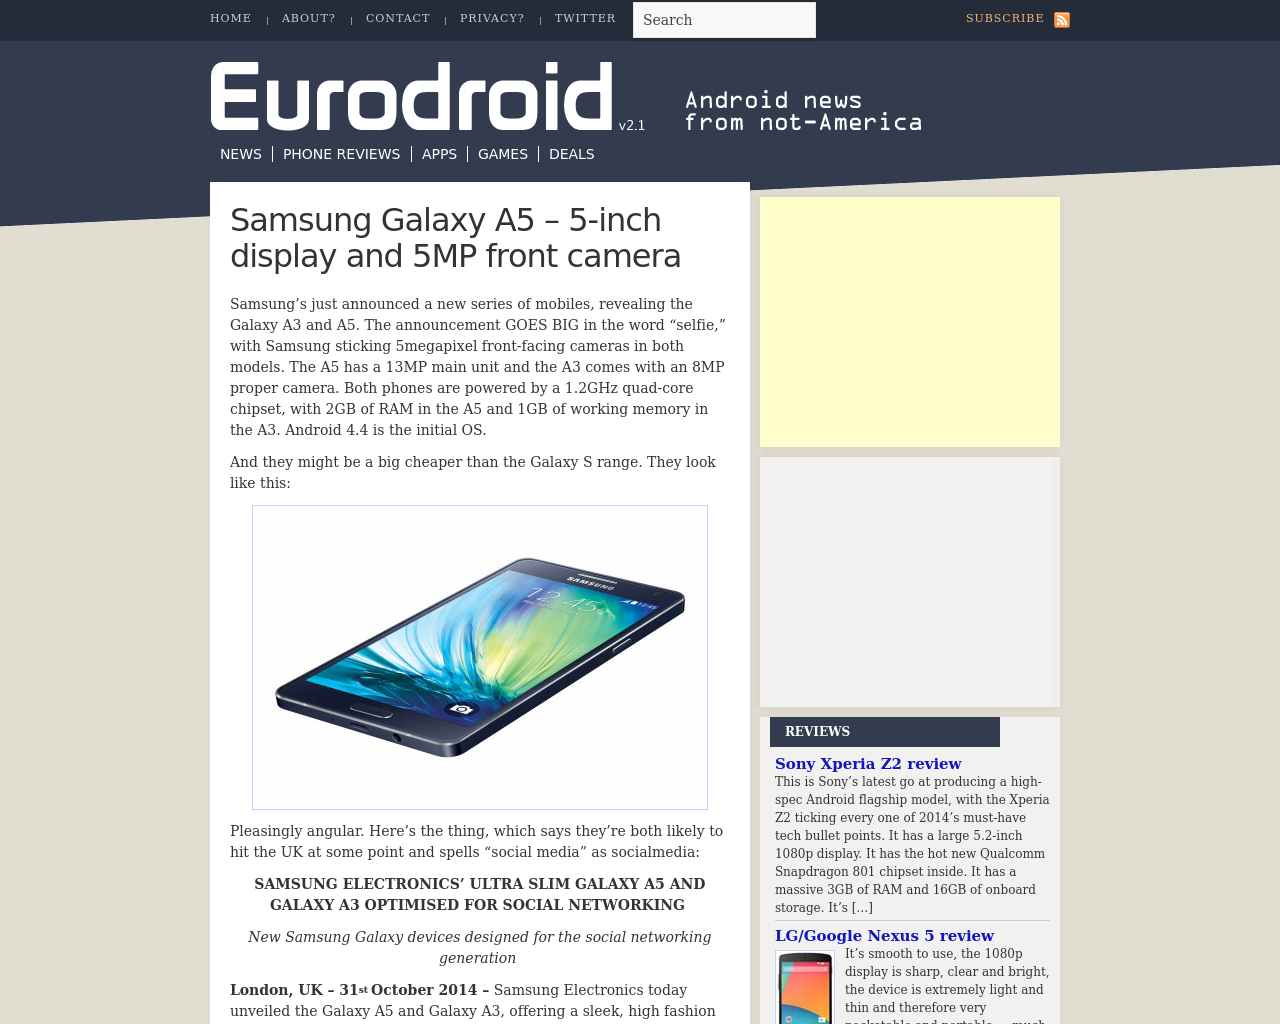 Eurodroid-Advertising-Reviews-Pricing